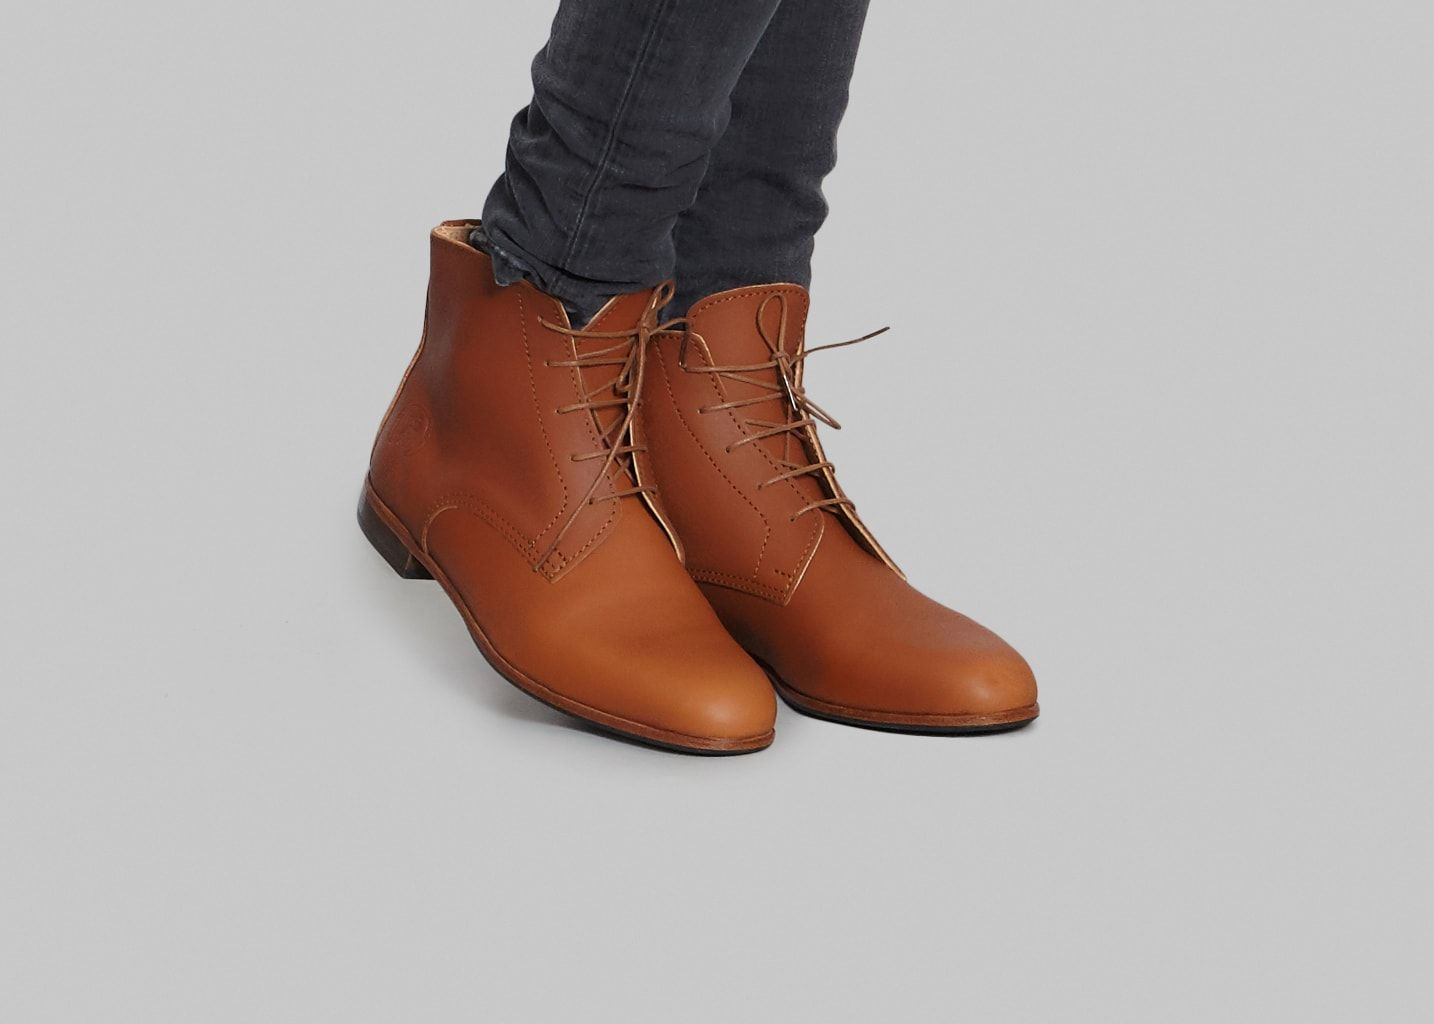 Bottines Bottines AlbertCombat Bottines AlbertCombat BootsShoes BootsShoes 6b7fyvYg